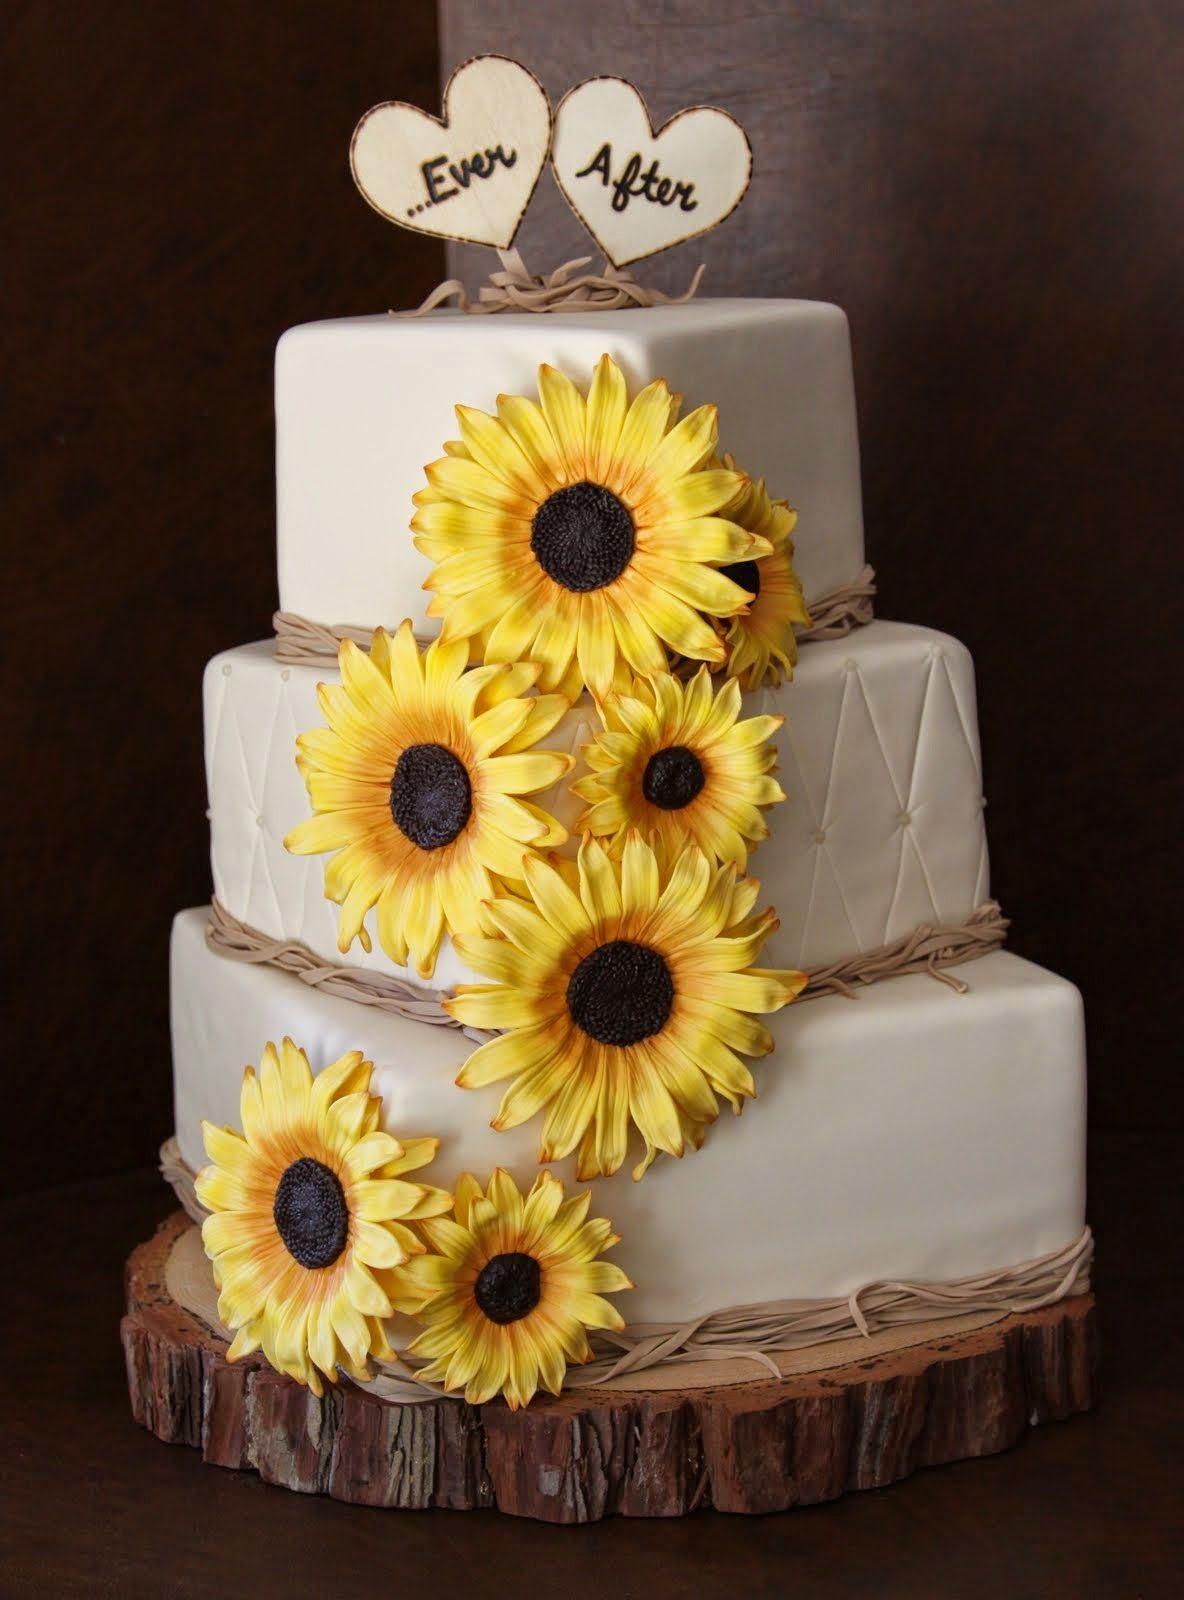 Wedding decorations purple october 2018 Sunflower Wedding Cake  simpleweddingstuffspot